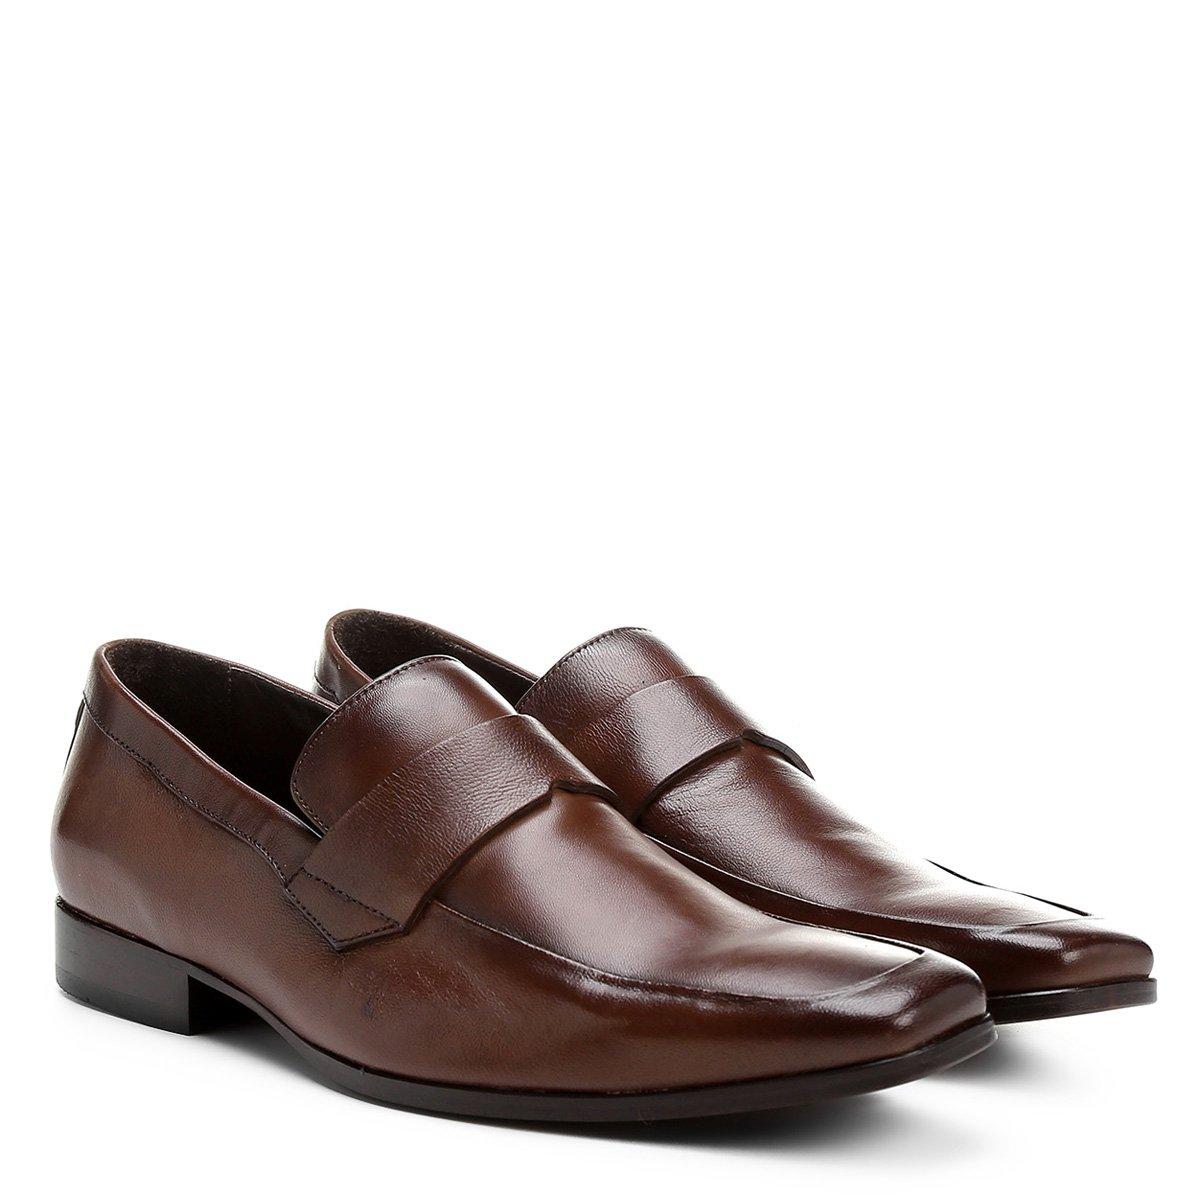 c703d4643d Sapato Social Shoestock Sola Couro